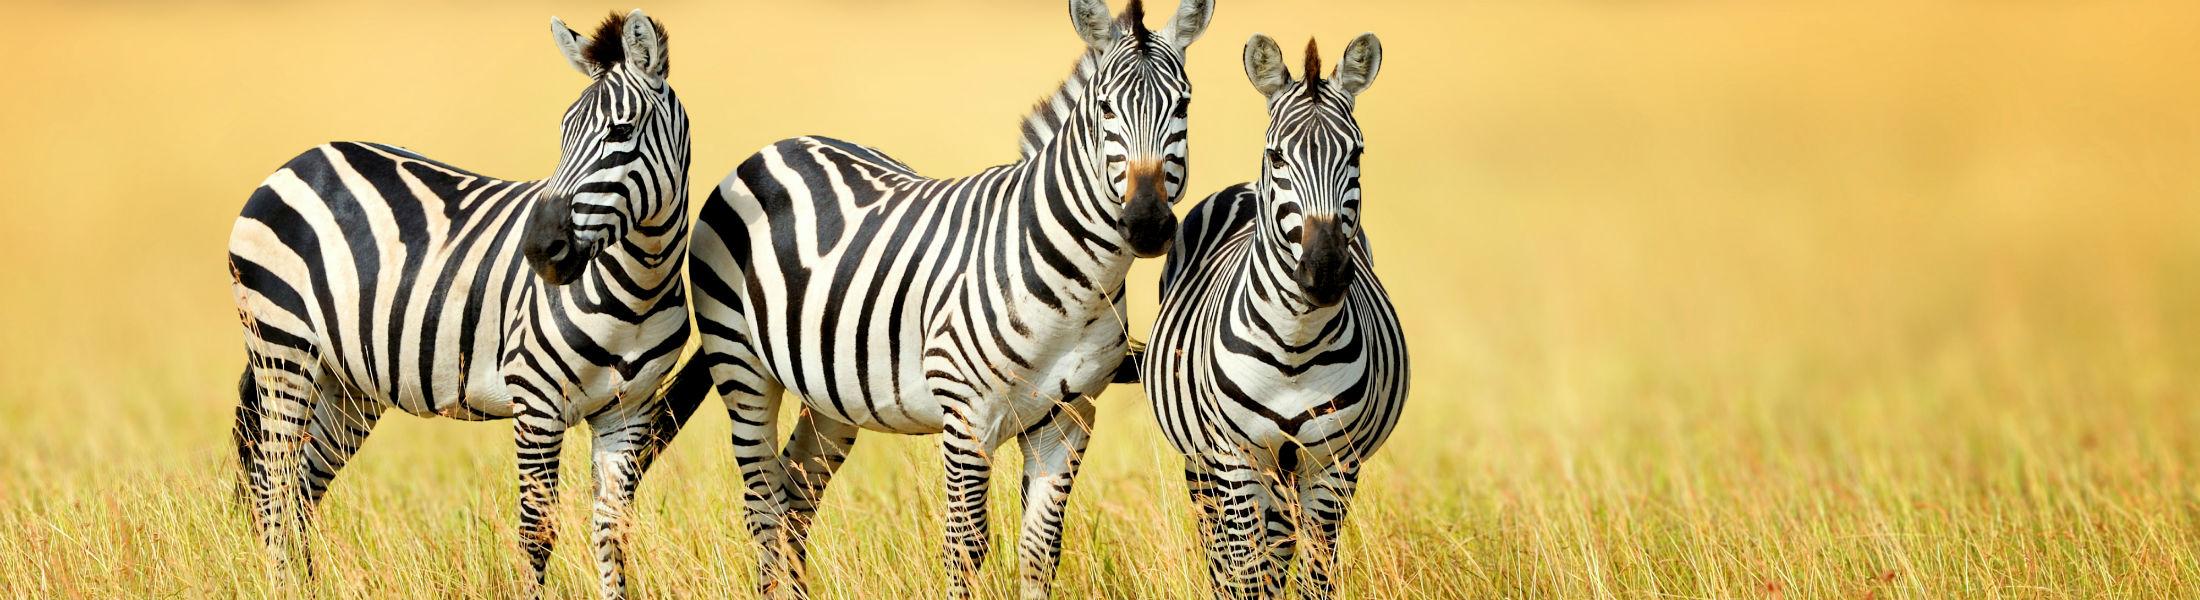 Zebras seen on a beach & safari holiday